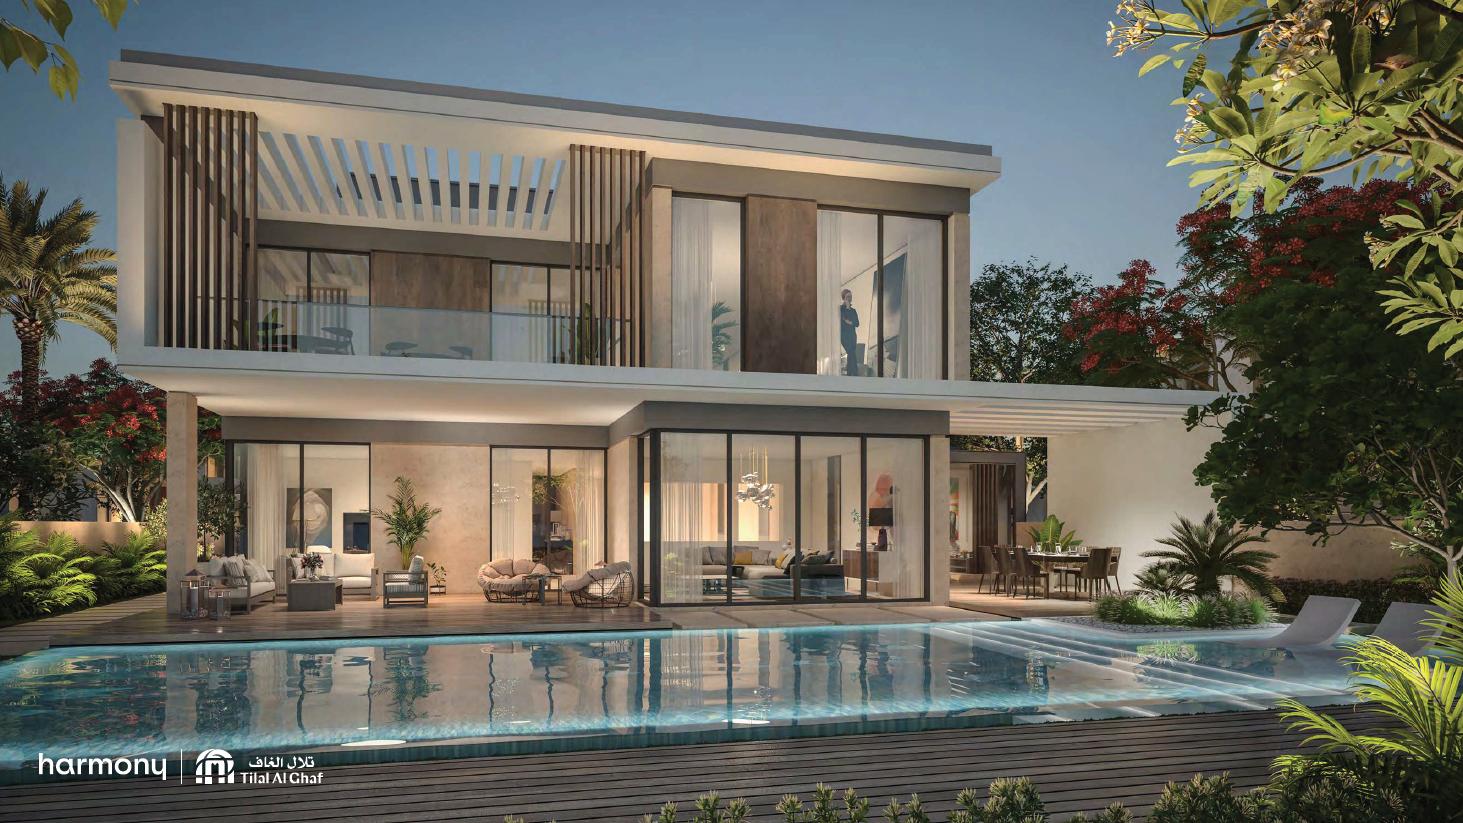 Luxurious 5-Bedroom Villa | Harmony | High Demand